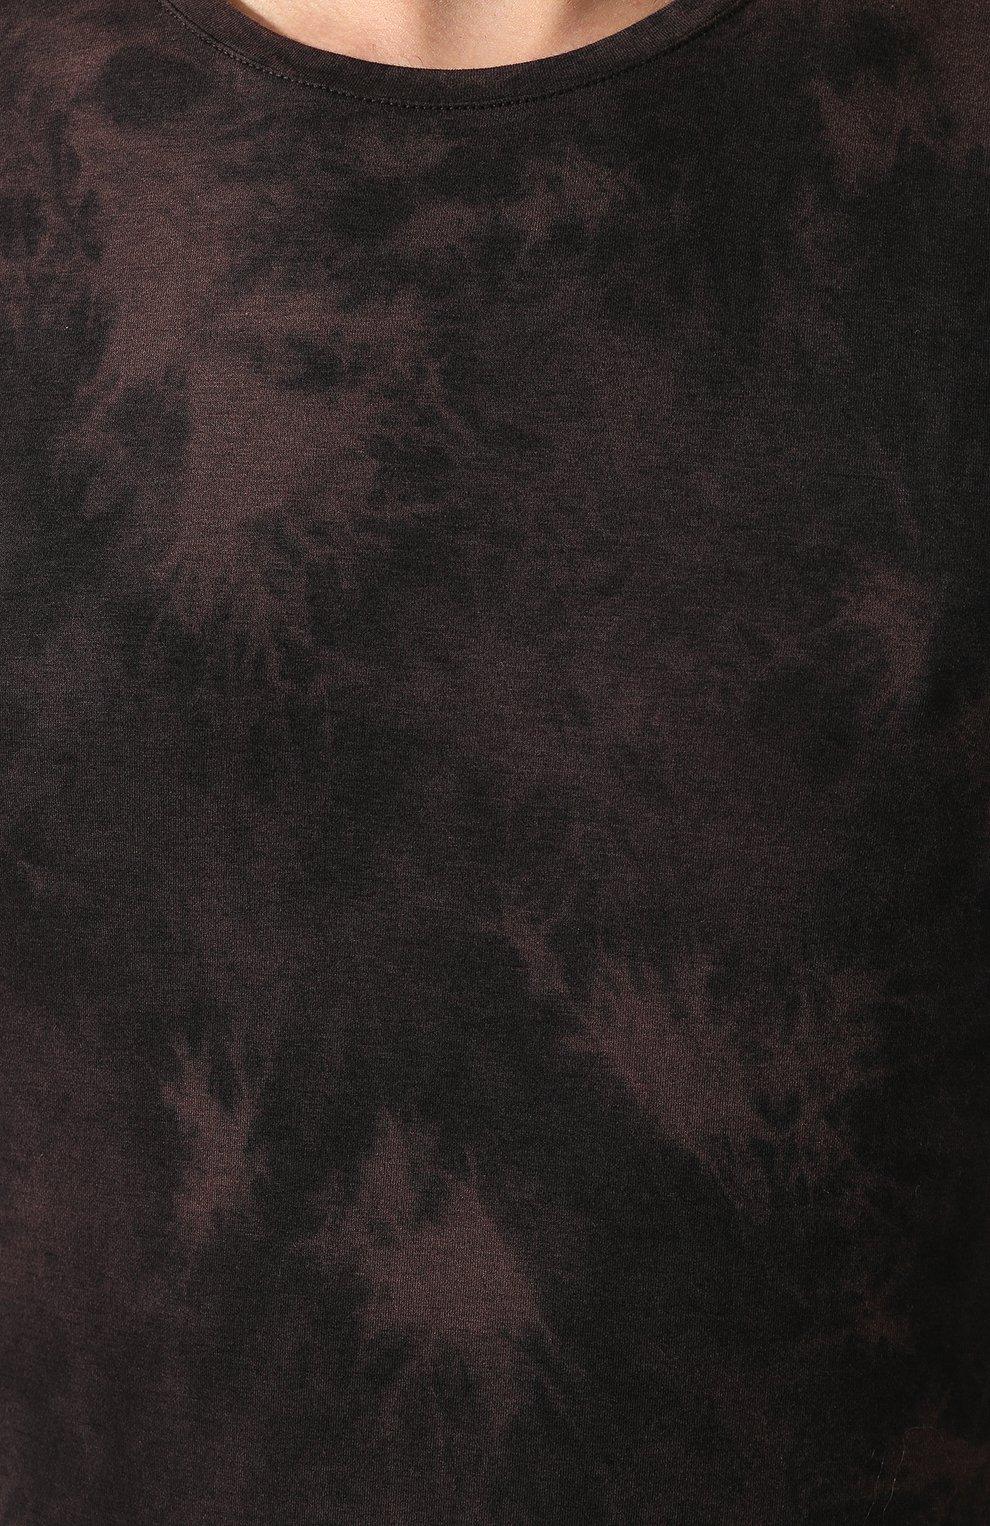 Мужская хлопковая футболка PAIGE темно-коричневого цвета, арт. M878F95-8053 | Фото 5